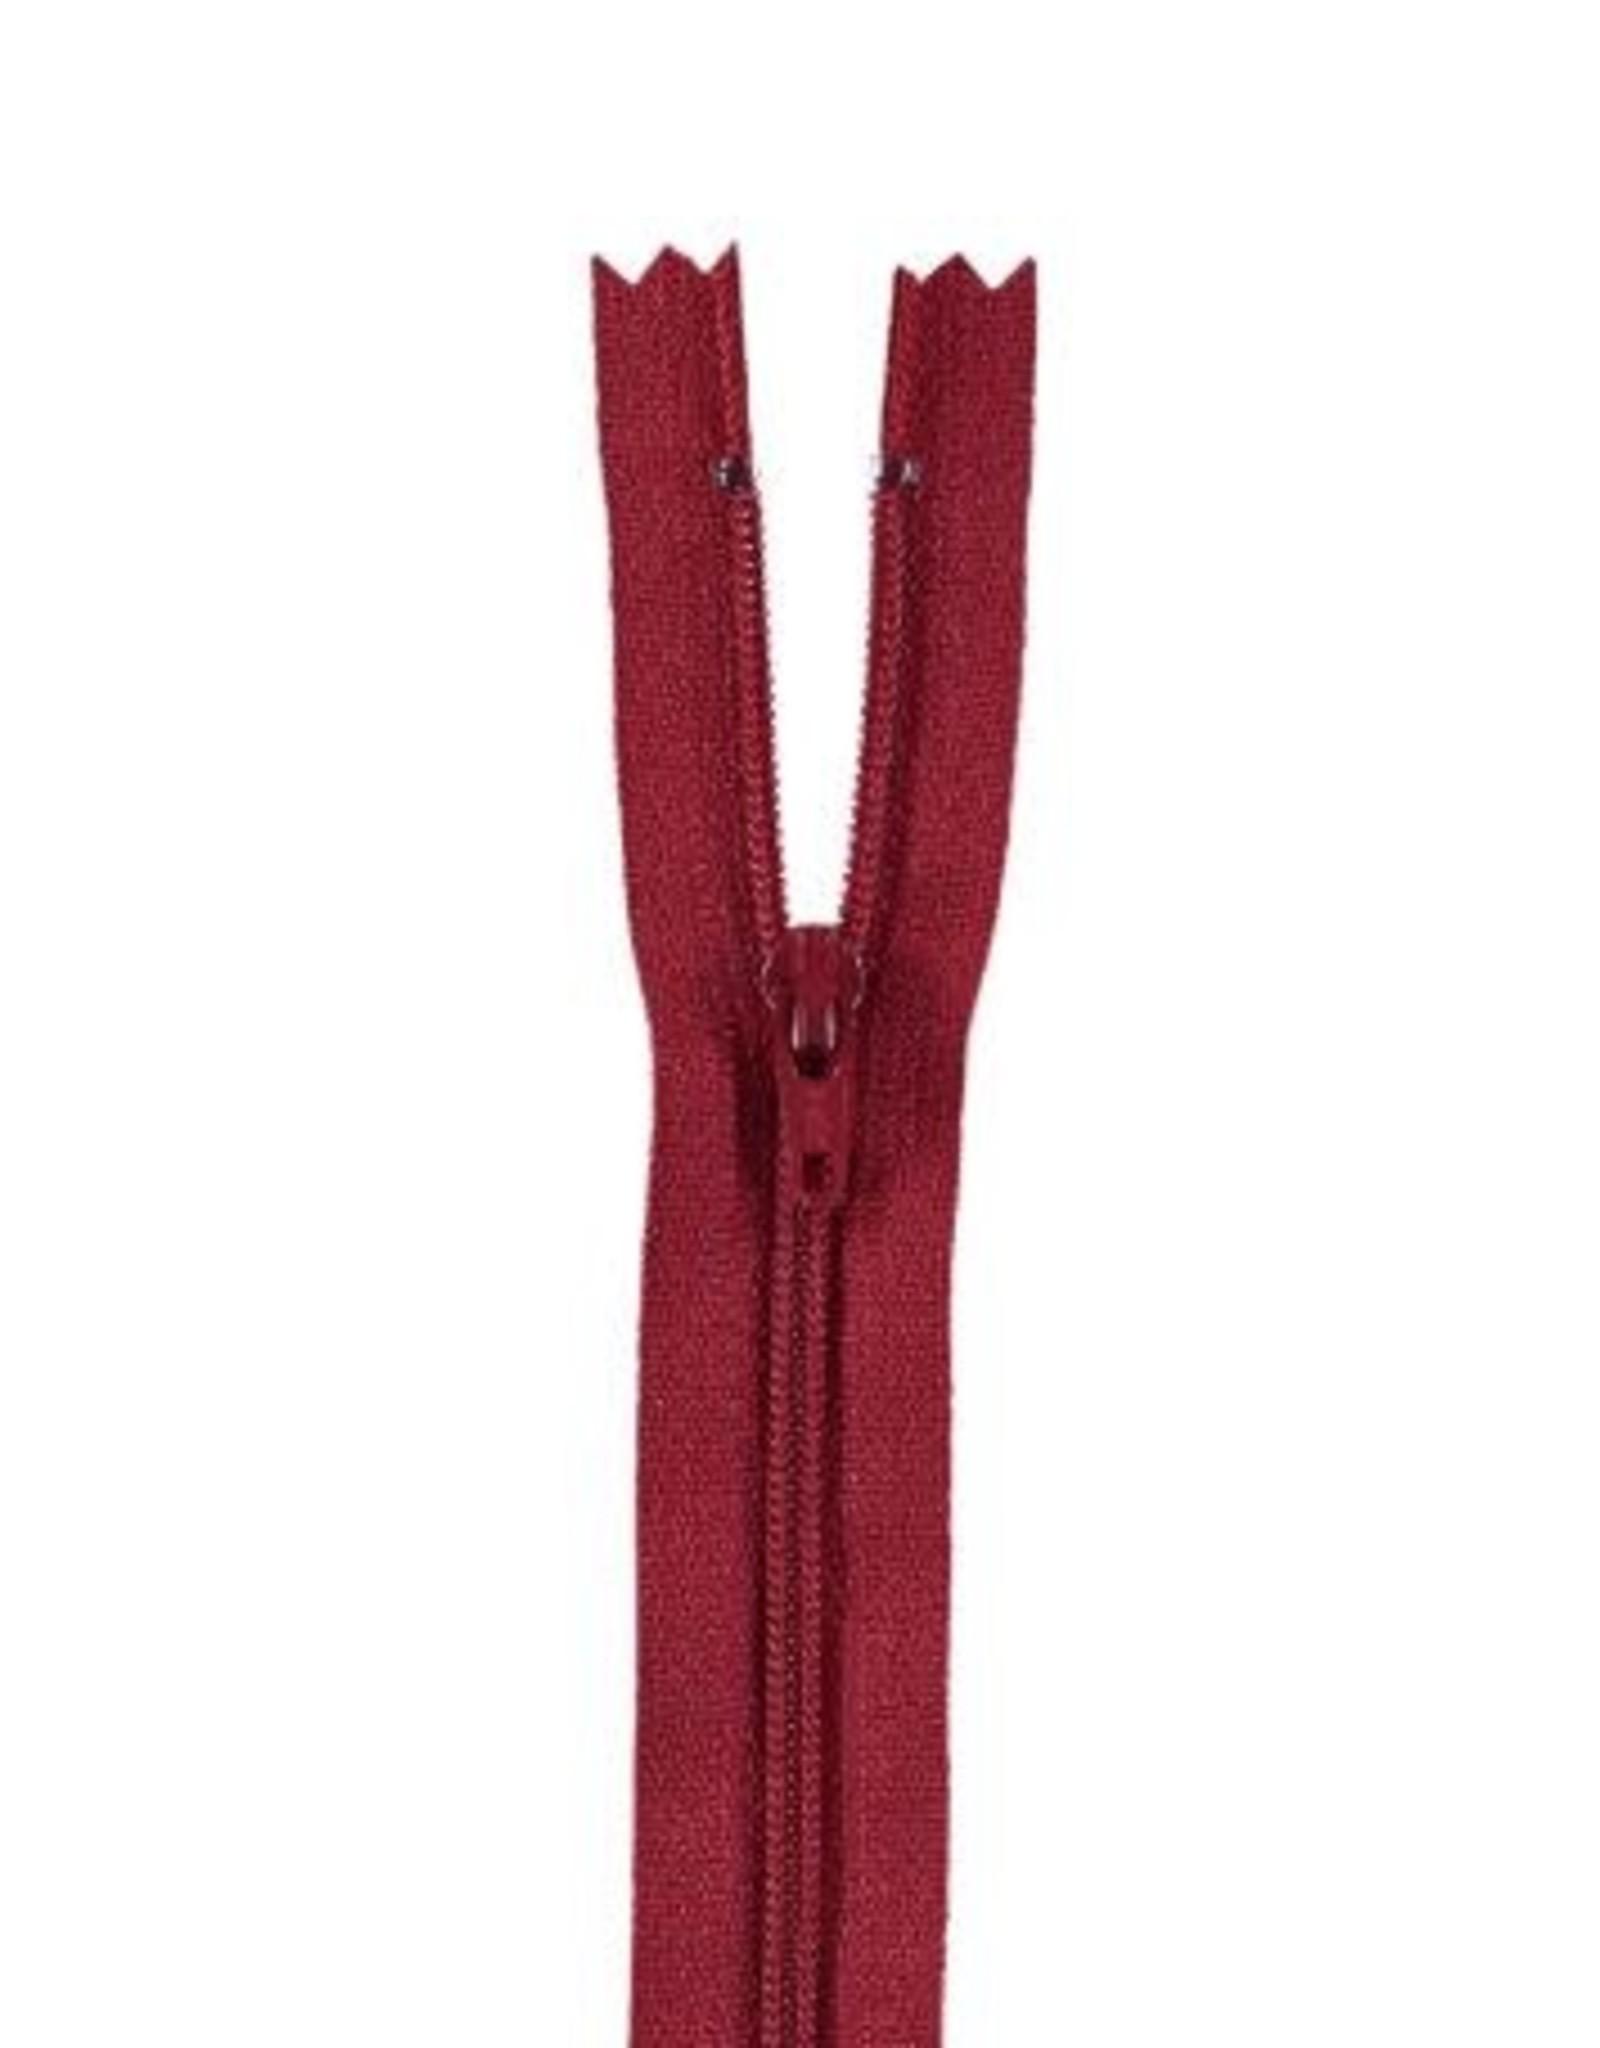 YKK Spiraalrits niet-DB 3mm donker rood 520-22cm